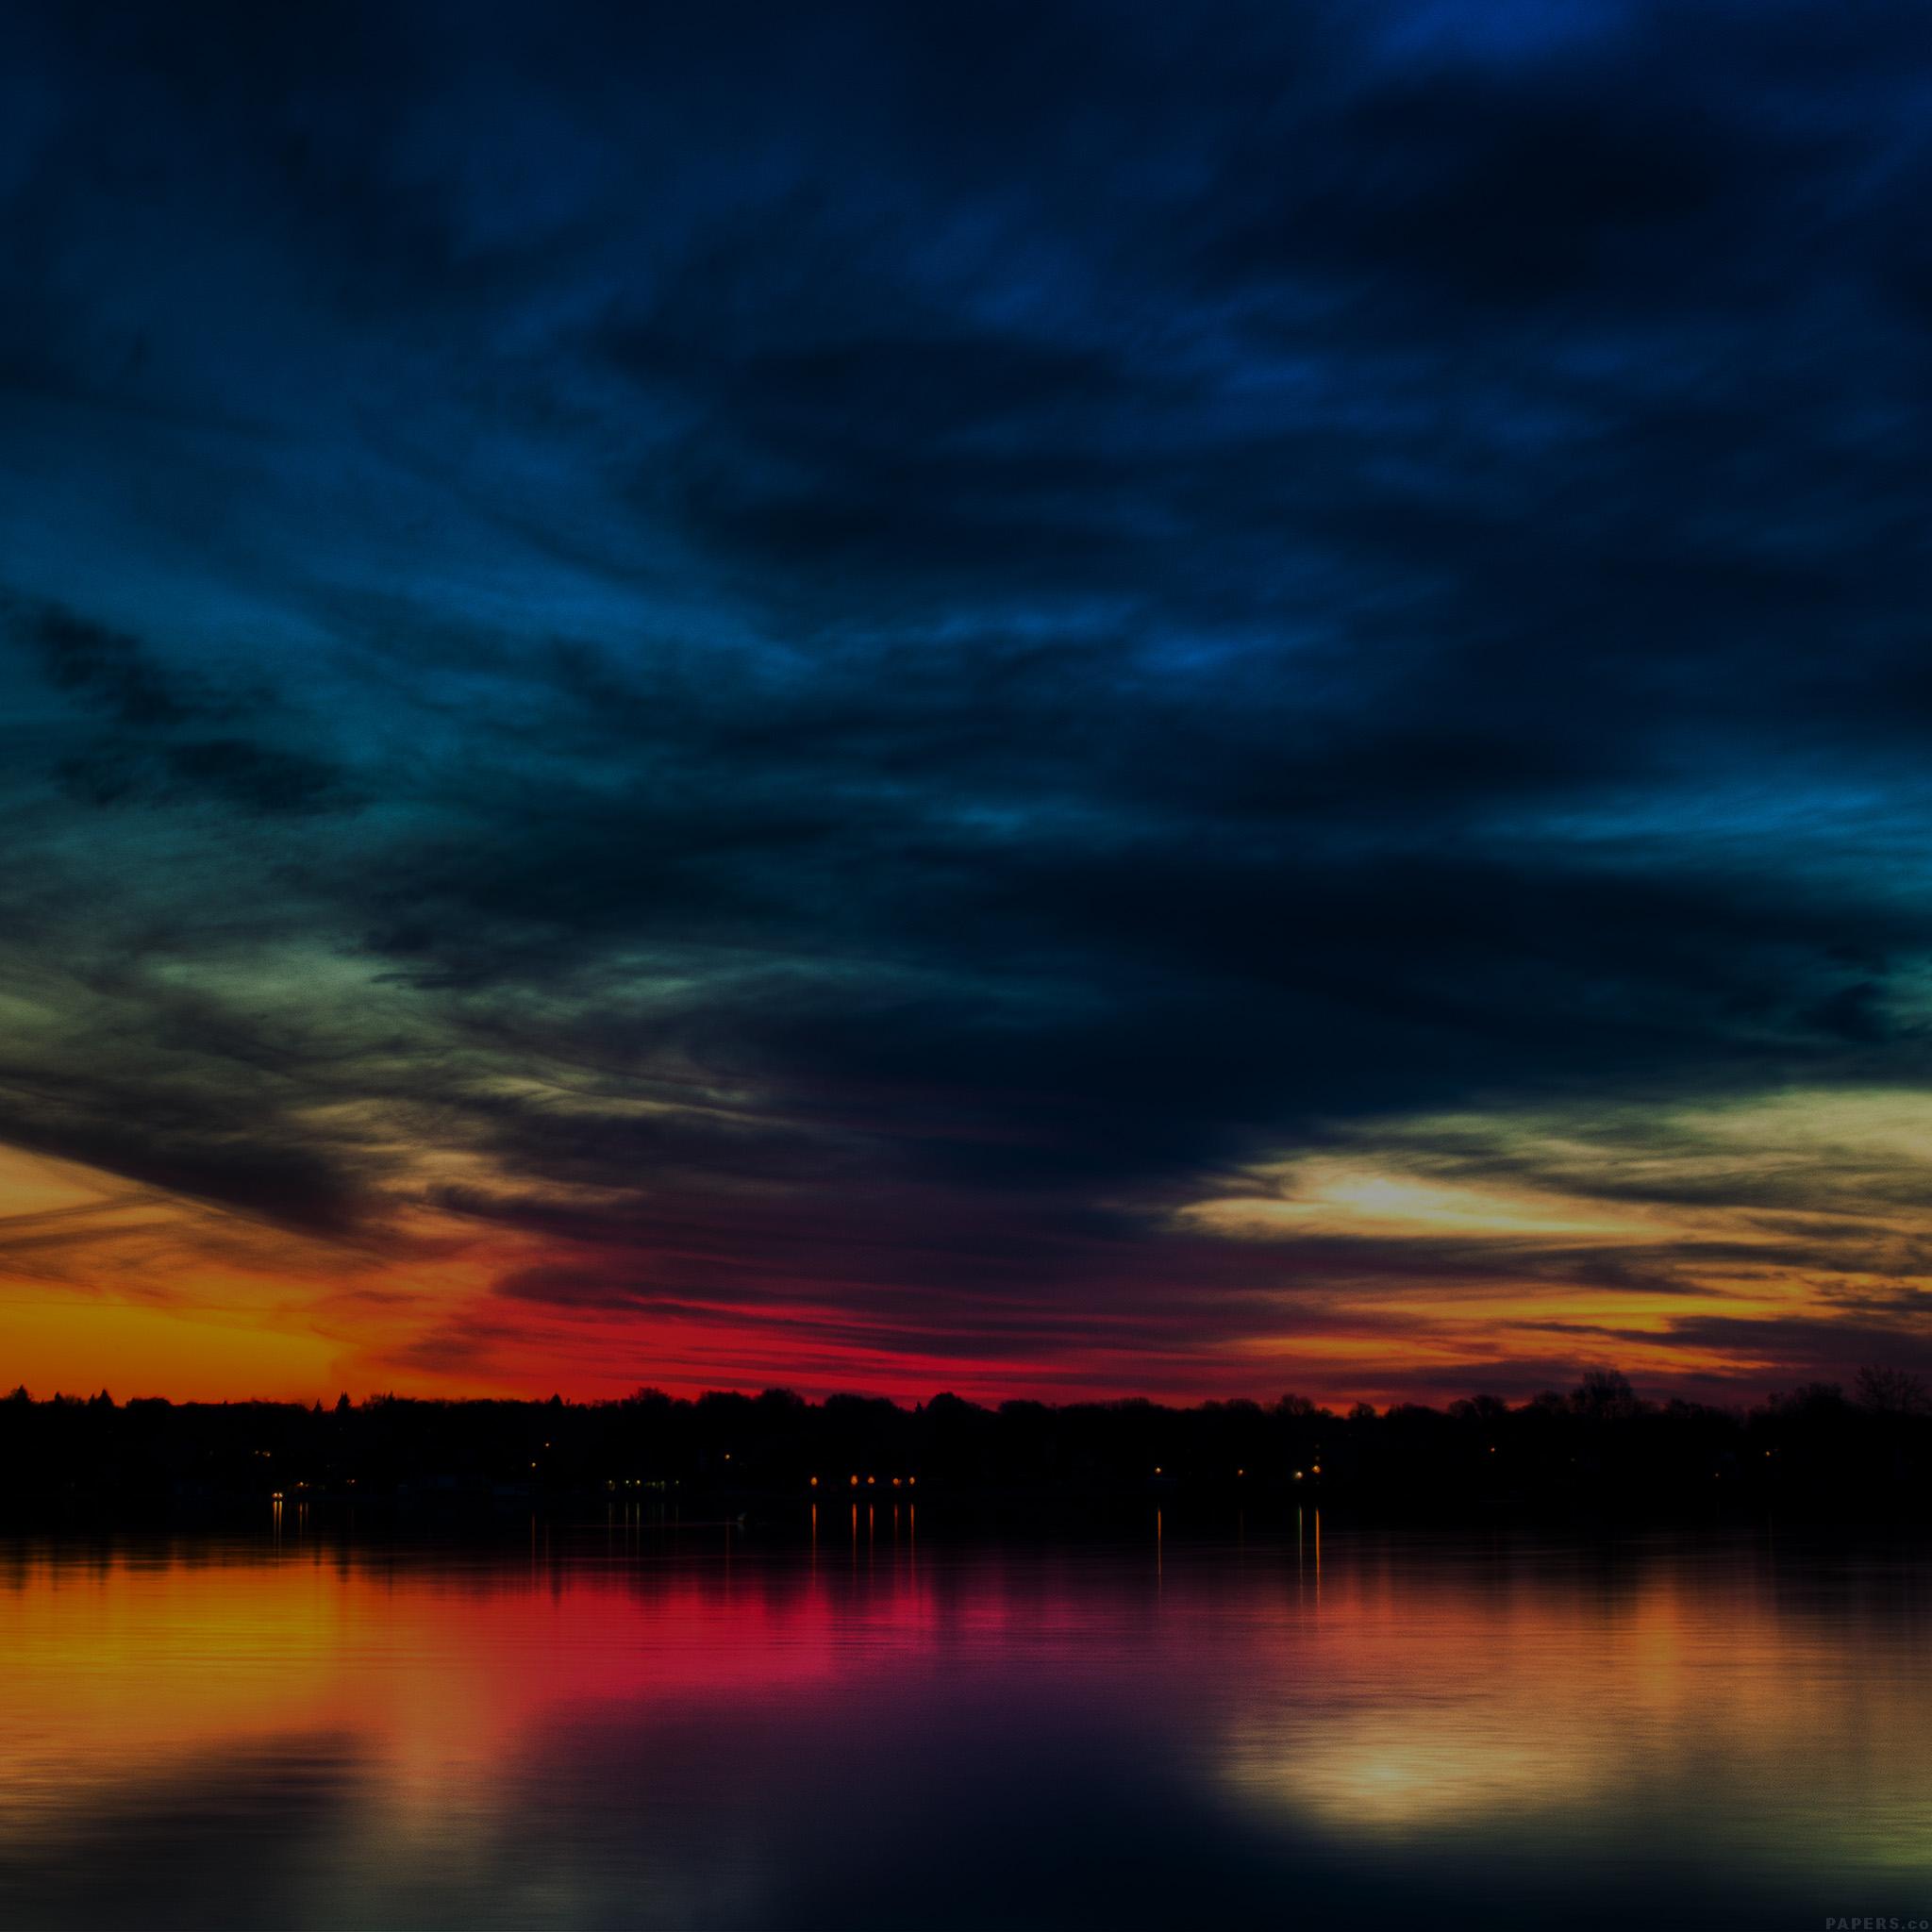 Samsung Galaxy Wallpaper Hd Mj80 Rainbow In The Sky Dark Lake Sea Nature Wallpaper